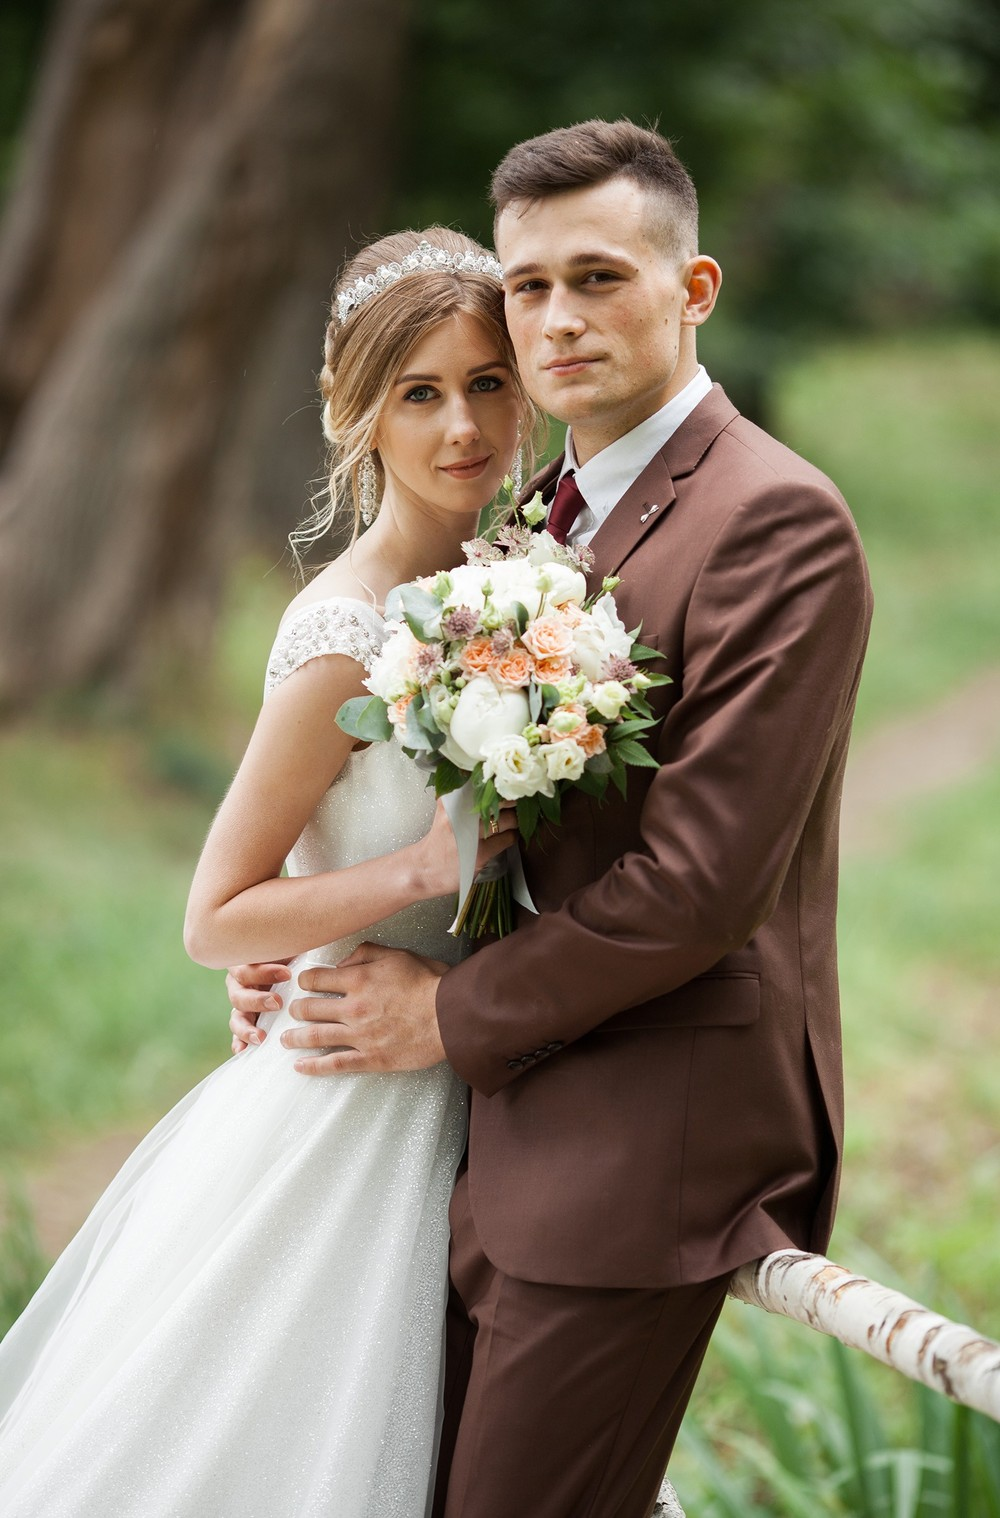 Павел и Анастасия